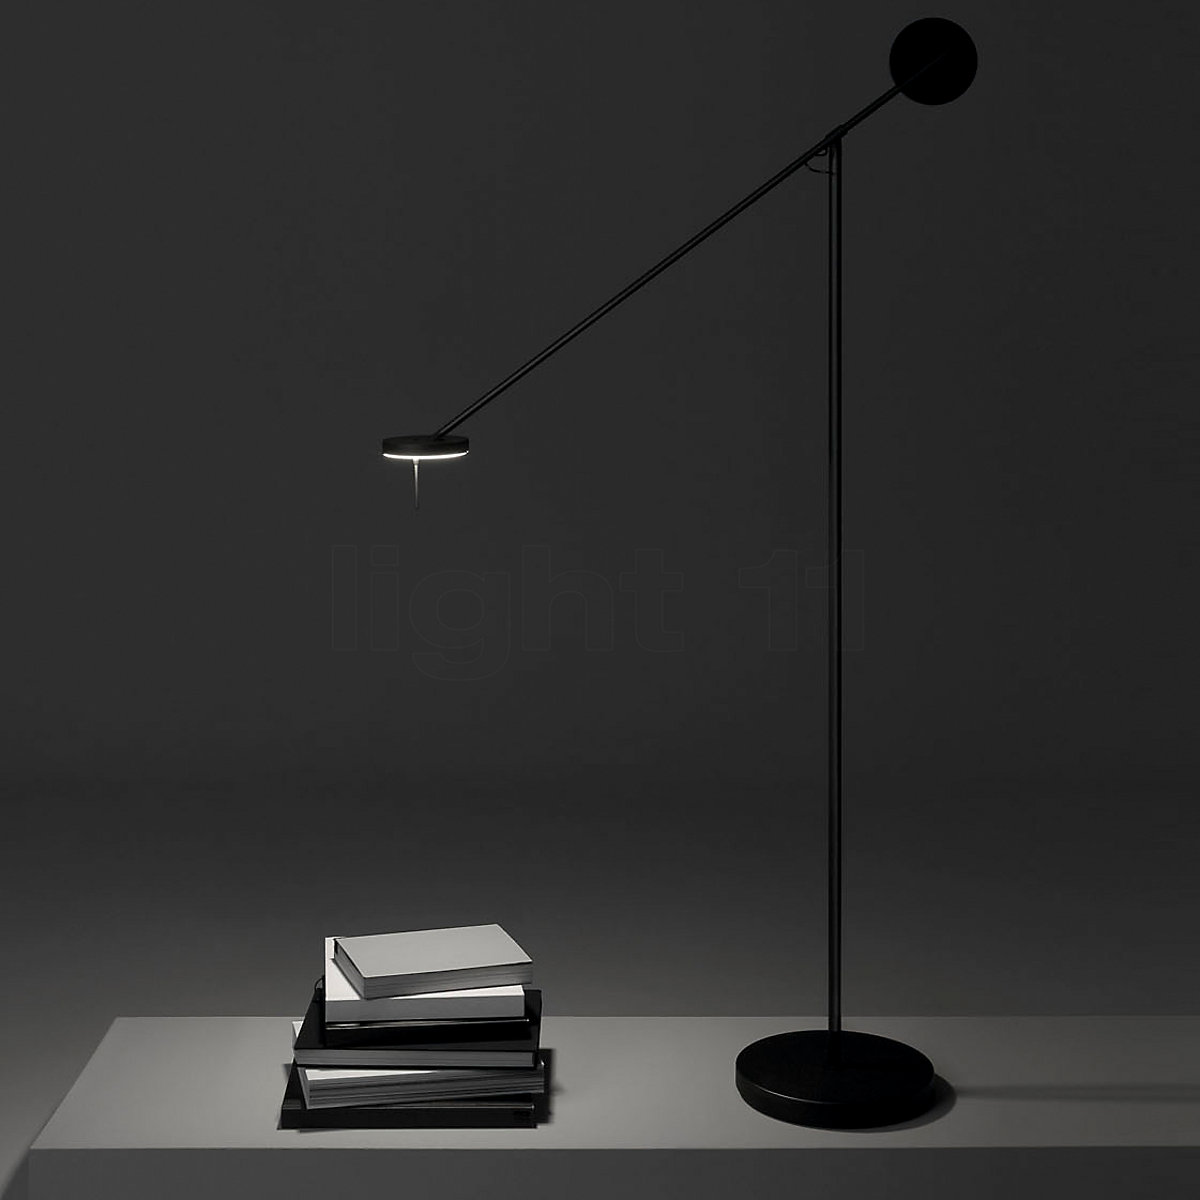 Grok_by_LEDS_C4_Invisible_lampara_de_pie_y_lectura--a7998bbecc86567eb3ede9119d9b7f91